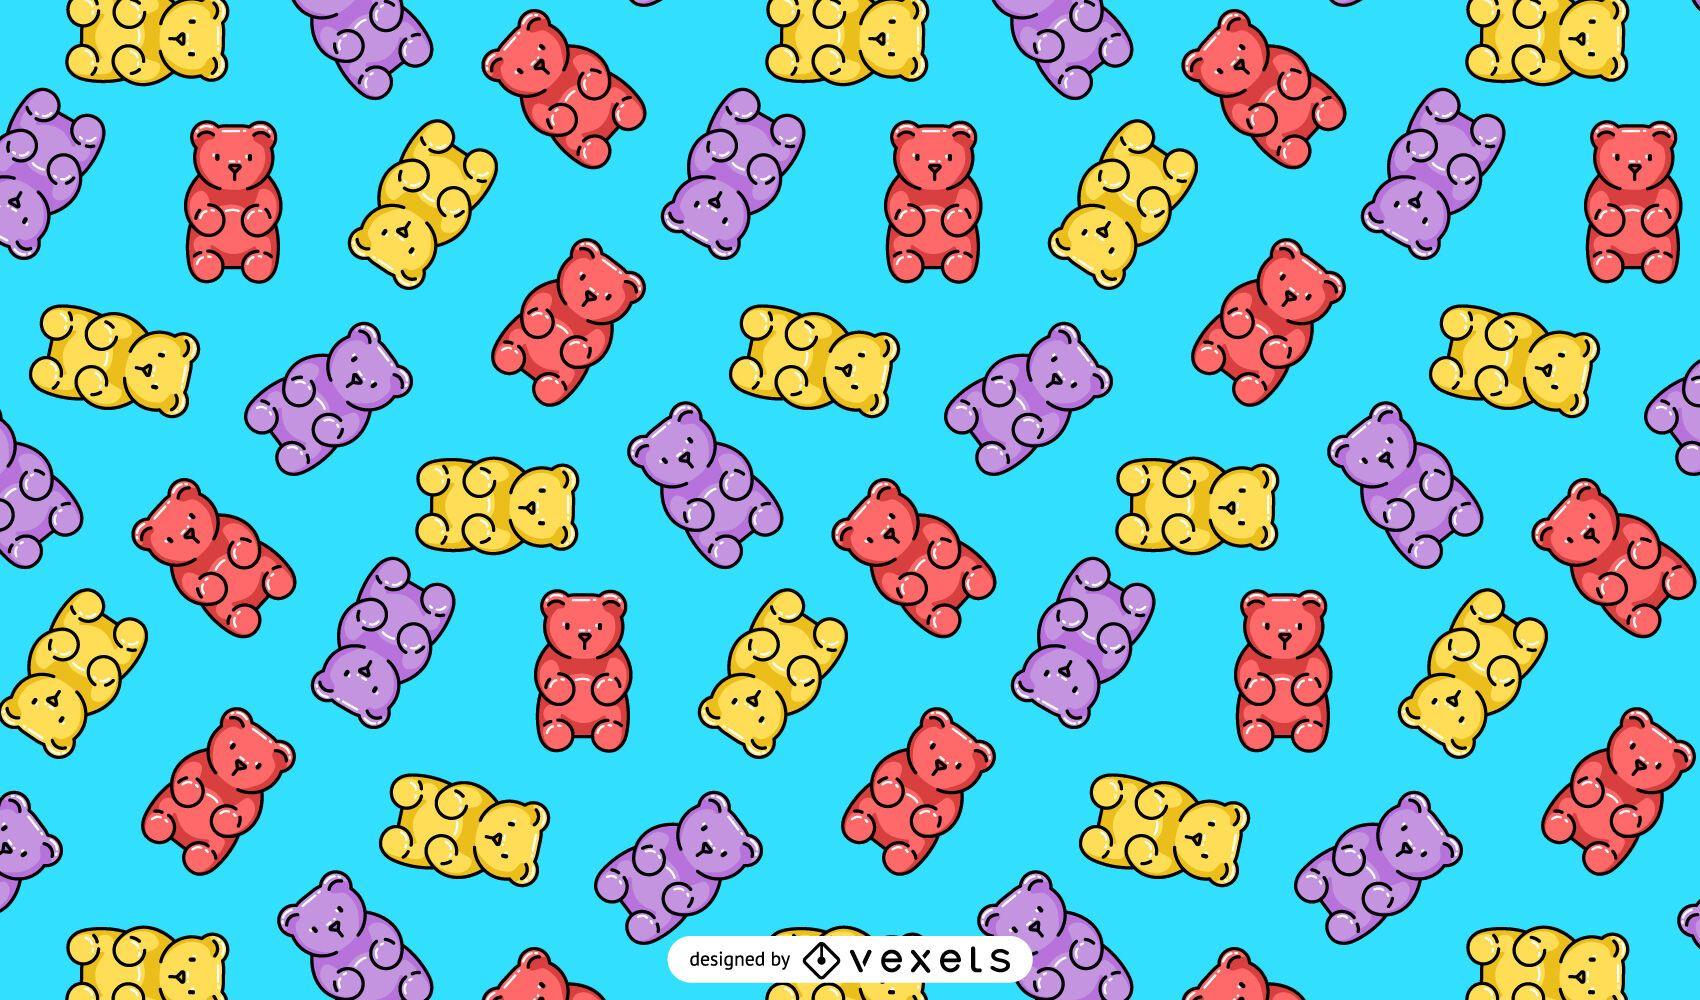 Gummy bears pattern design